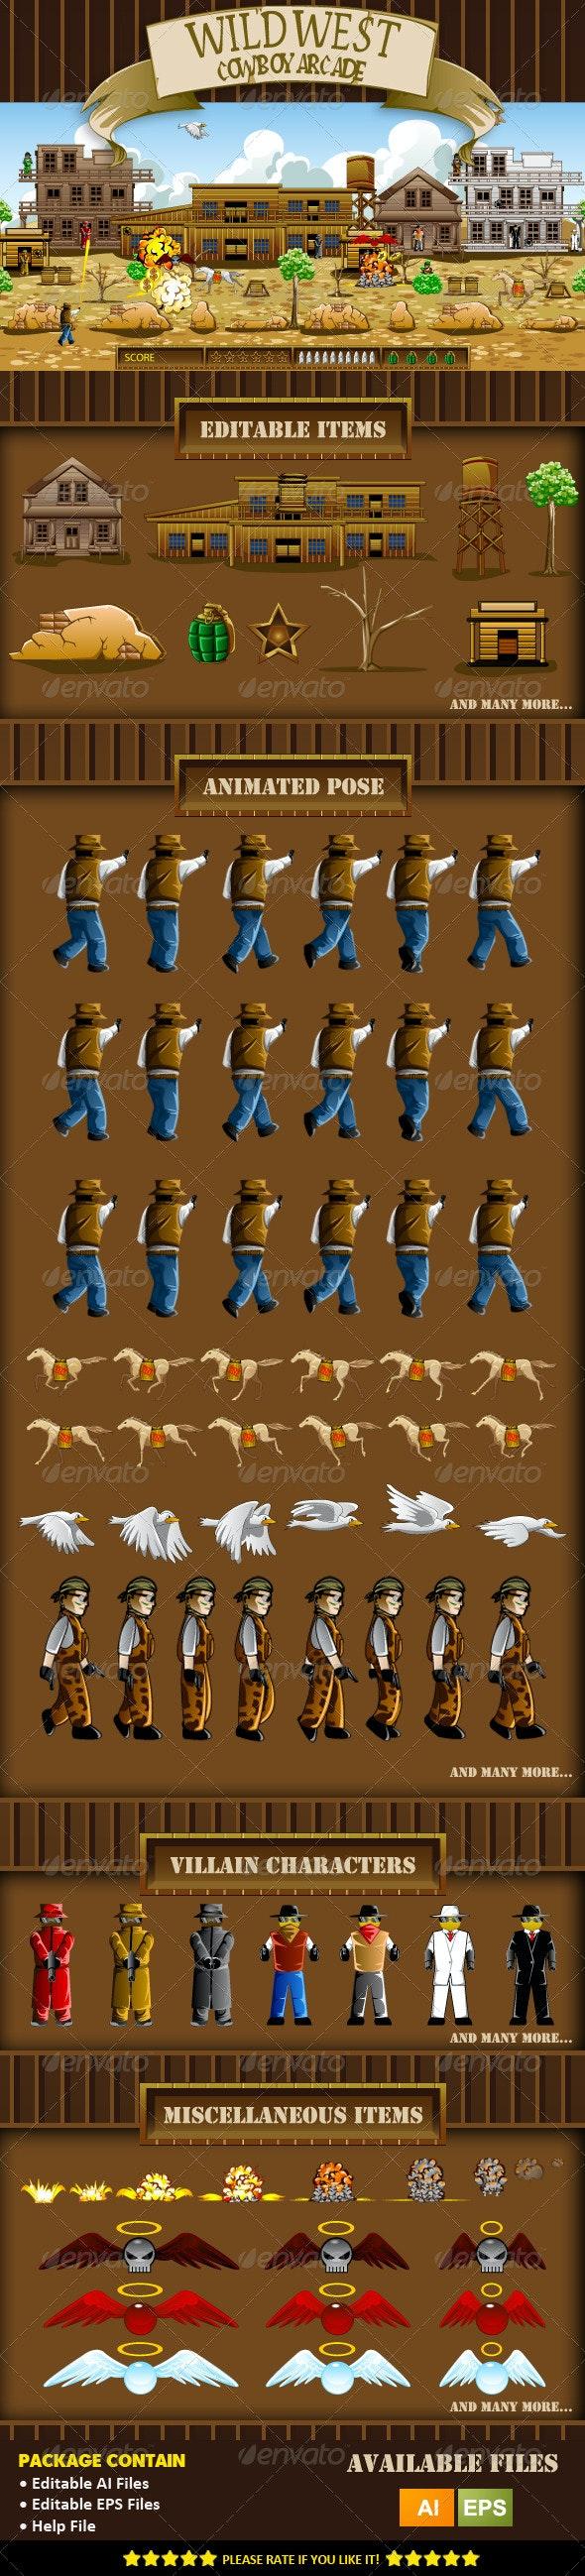 Wild West Cowboy Game Assets - Sprites Game Assets